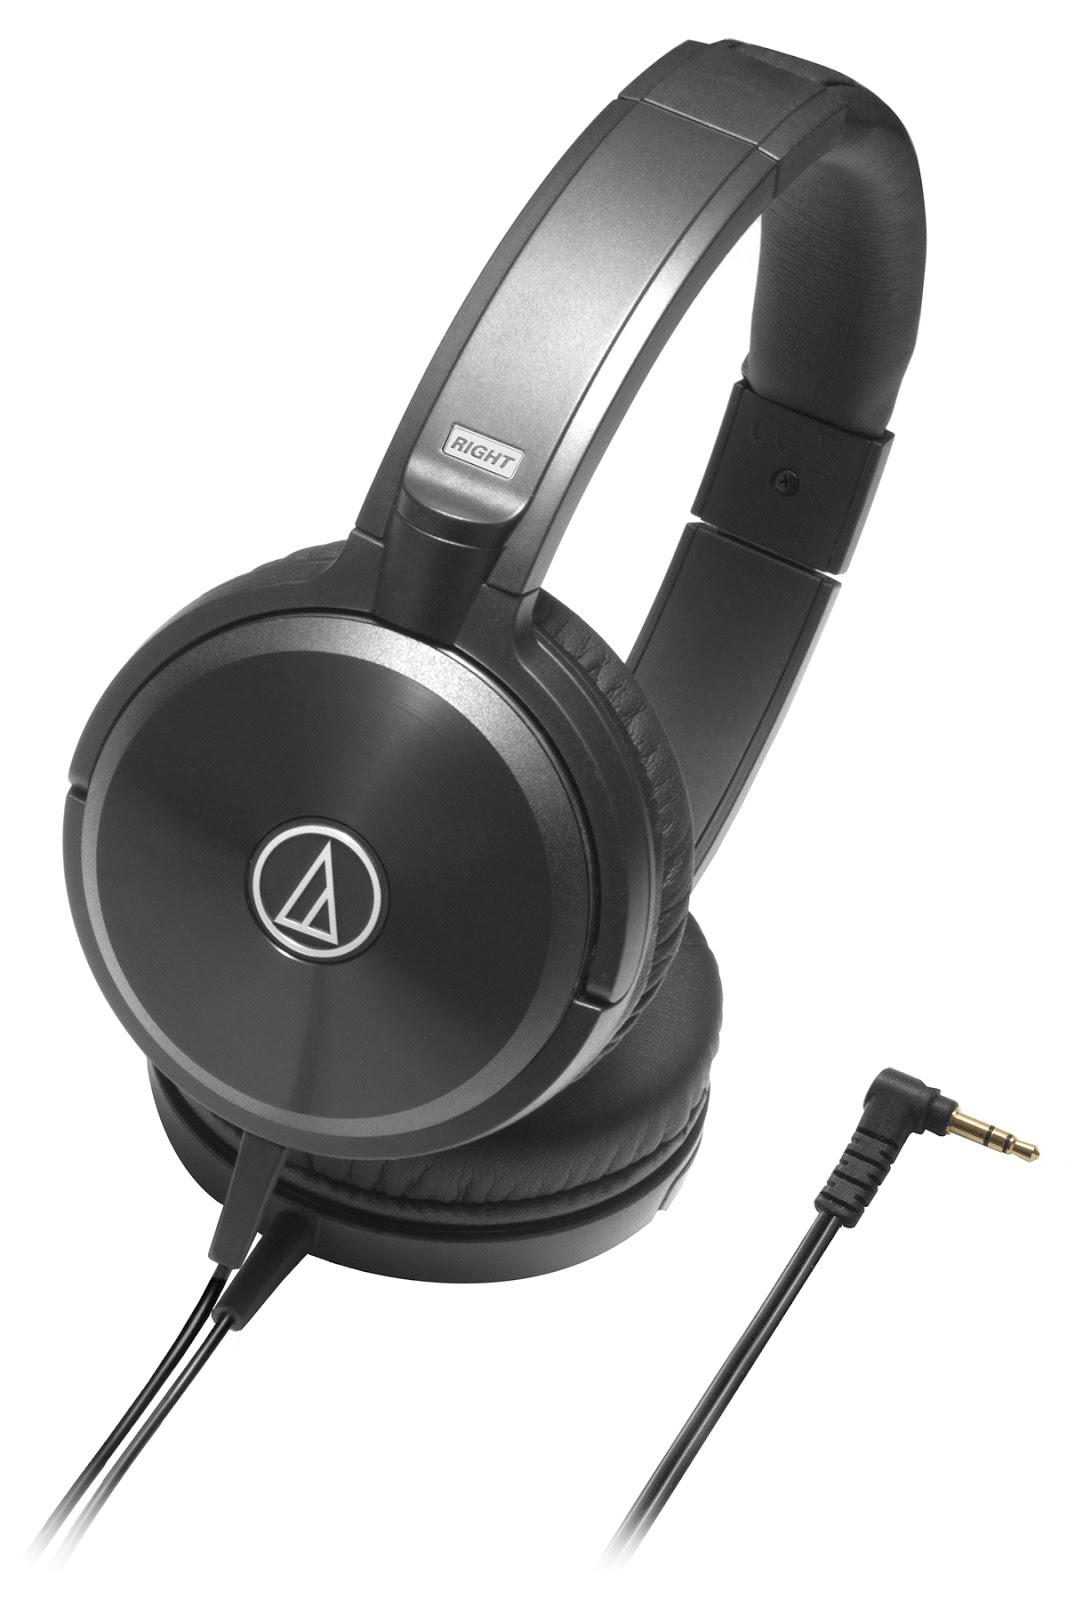 ath technology Buy audio   headphones   audio technica ath-m50x headphones (black) on hachitech - over 50000 tech gadgets & 400+ tech brands in 1 tech marketplace shop online - insider deals & offers valueclub member perks shop over 50000 gadgets.